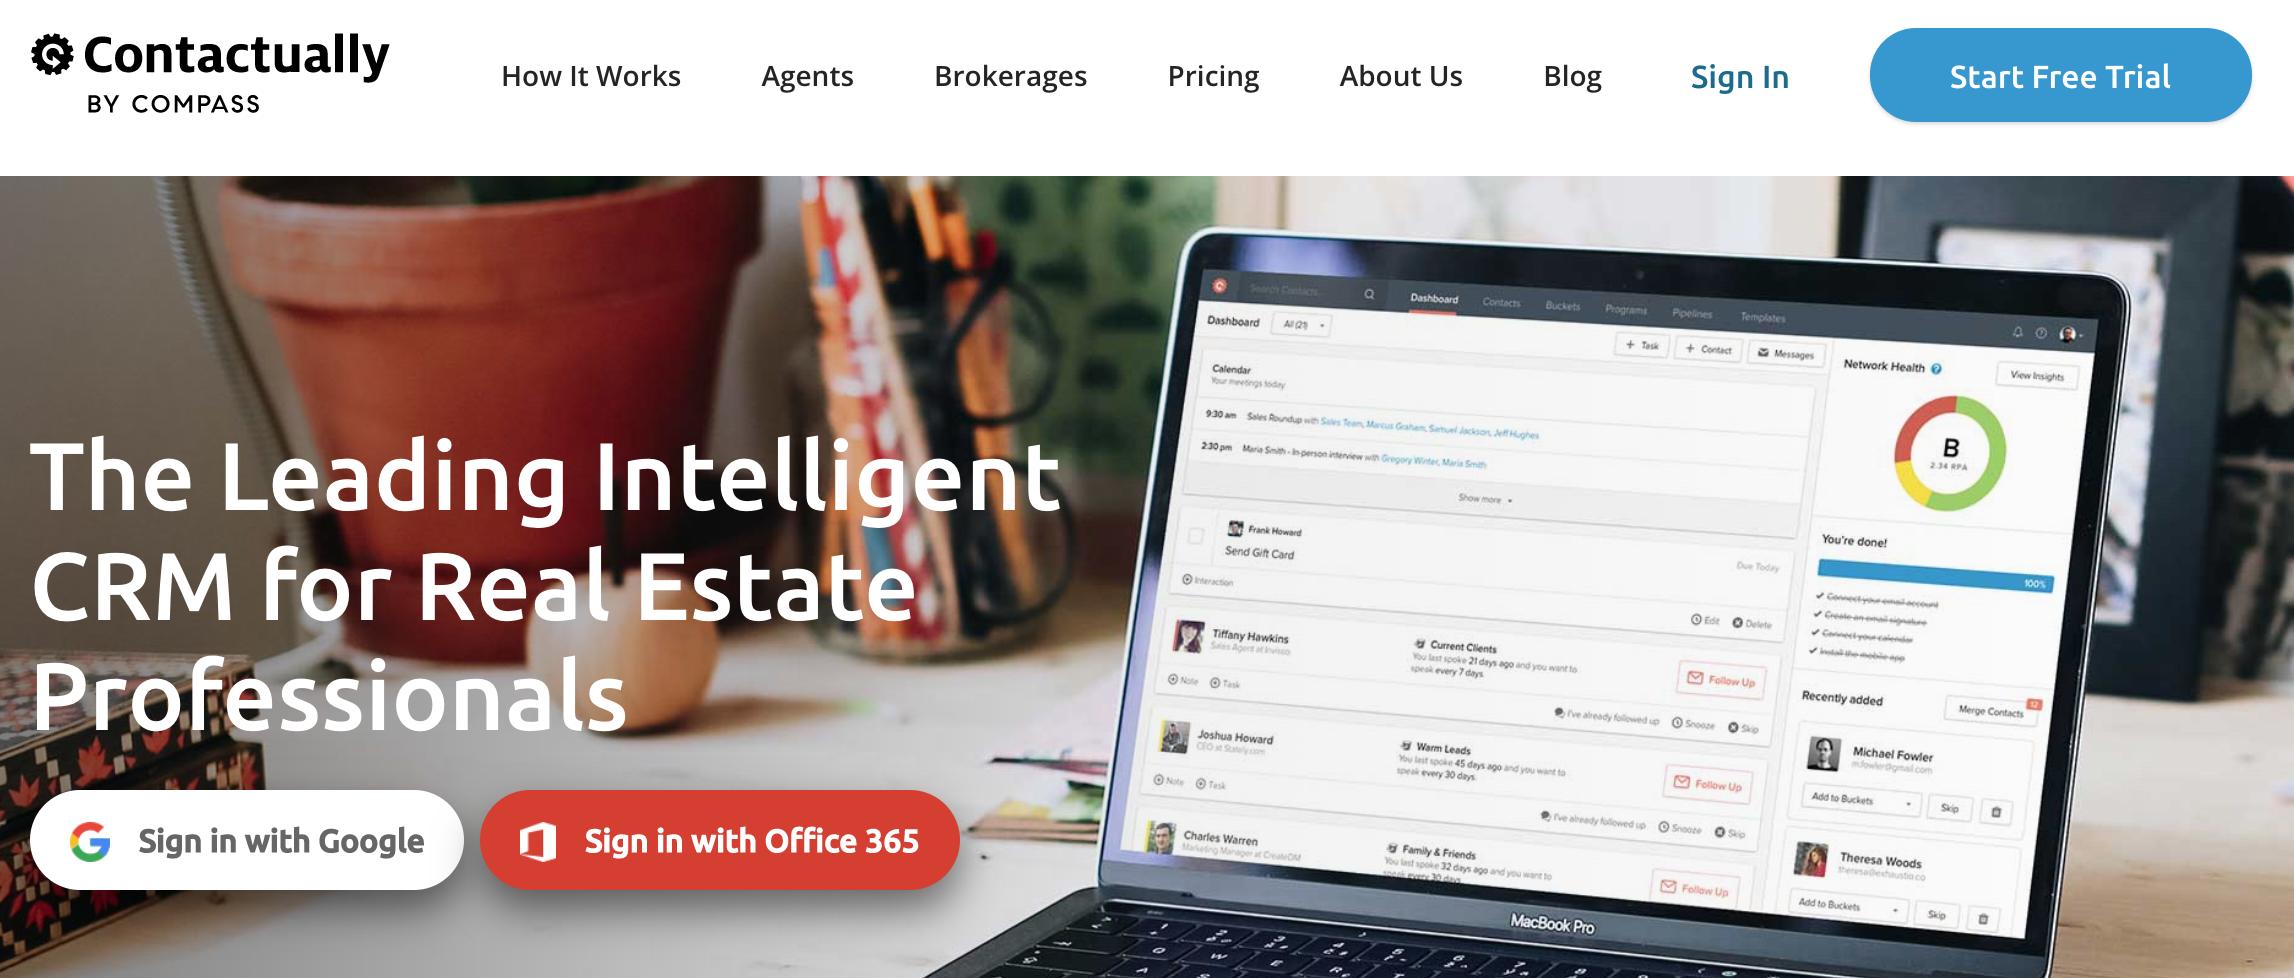 Screenshot of Contactually's website.